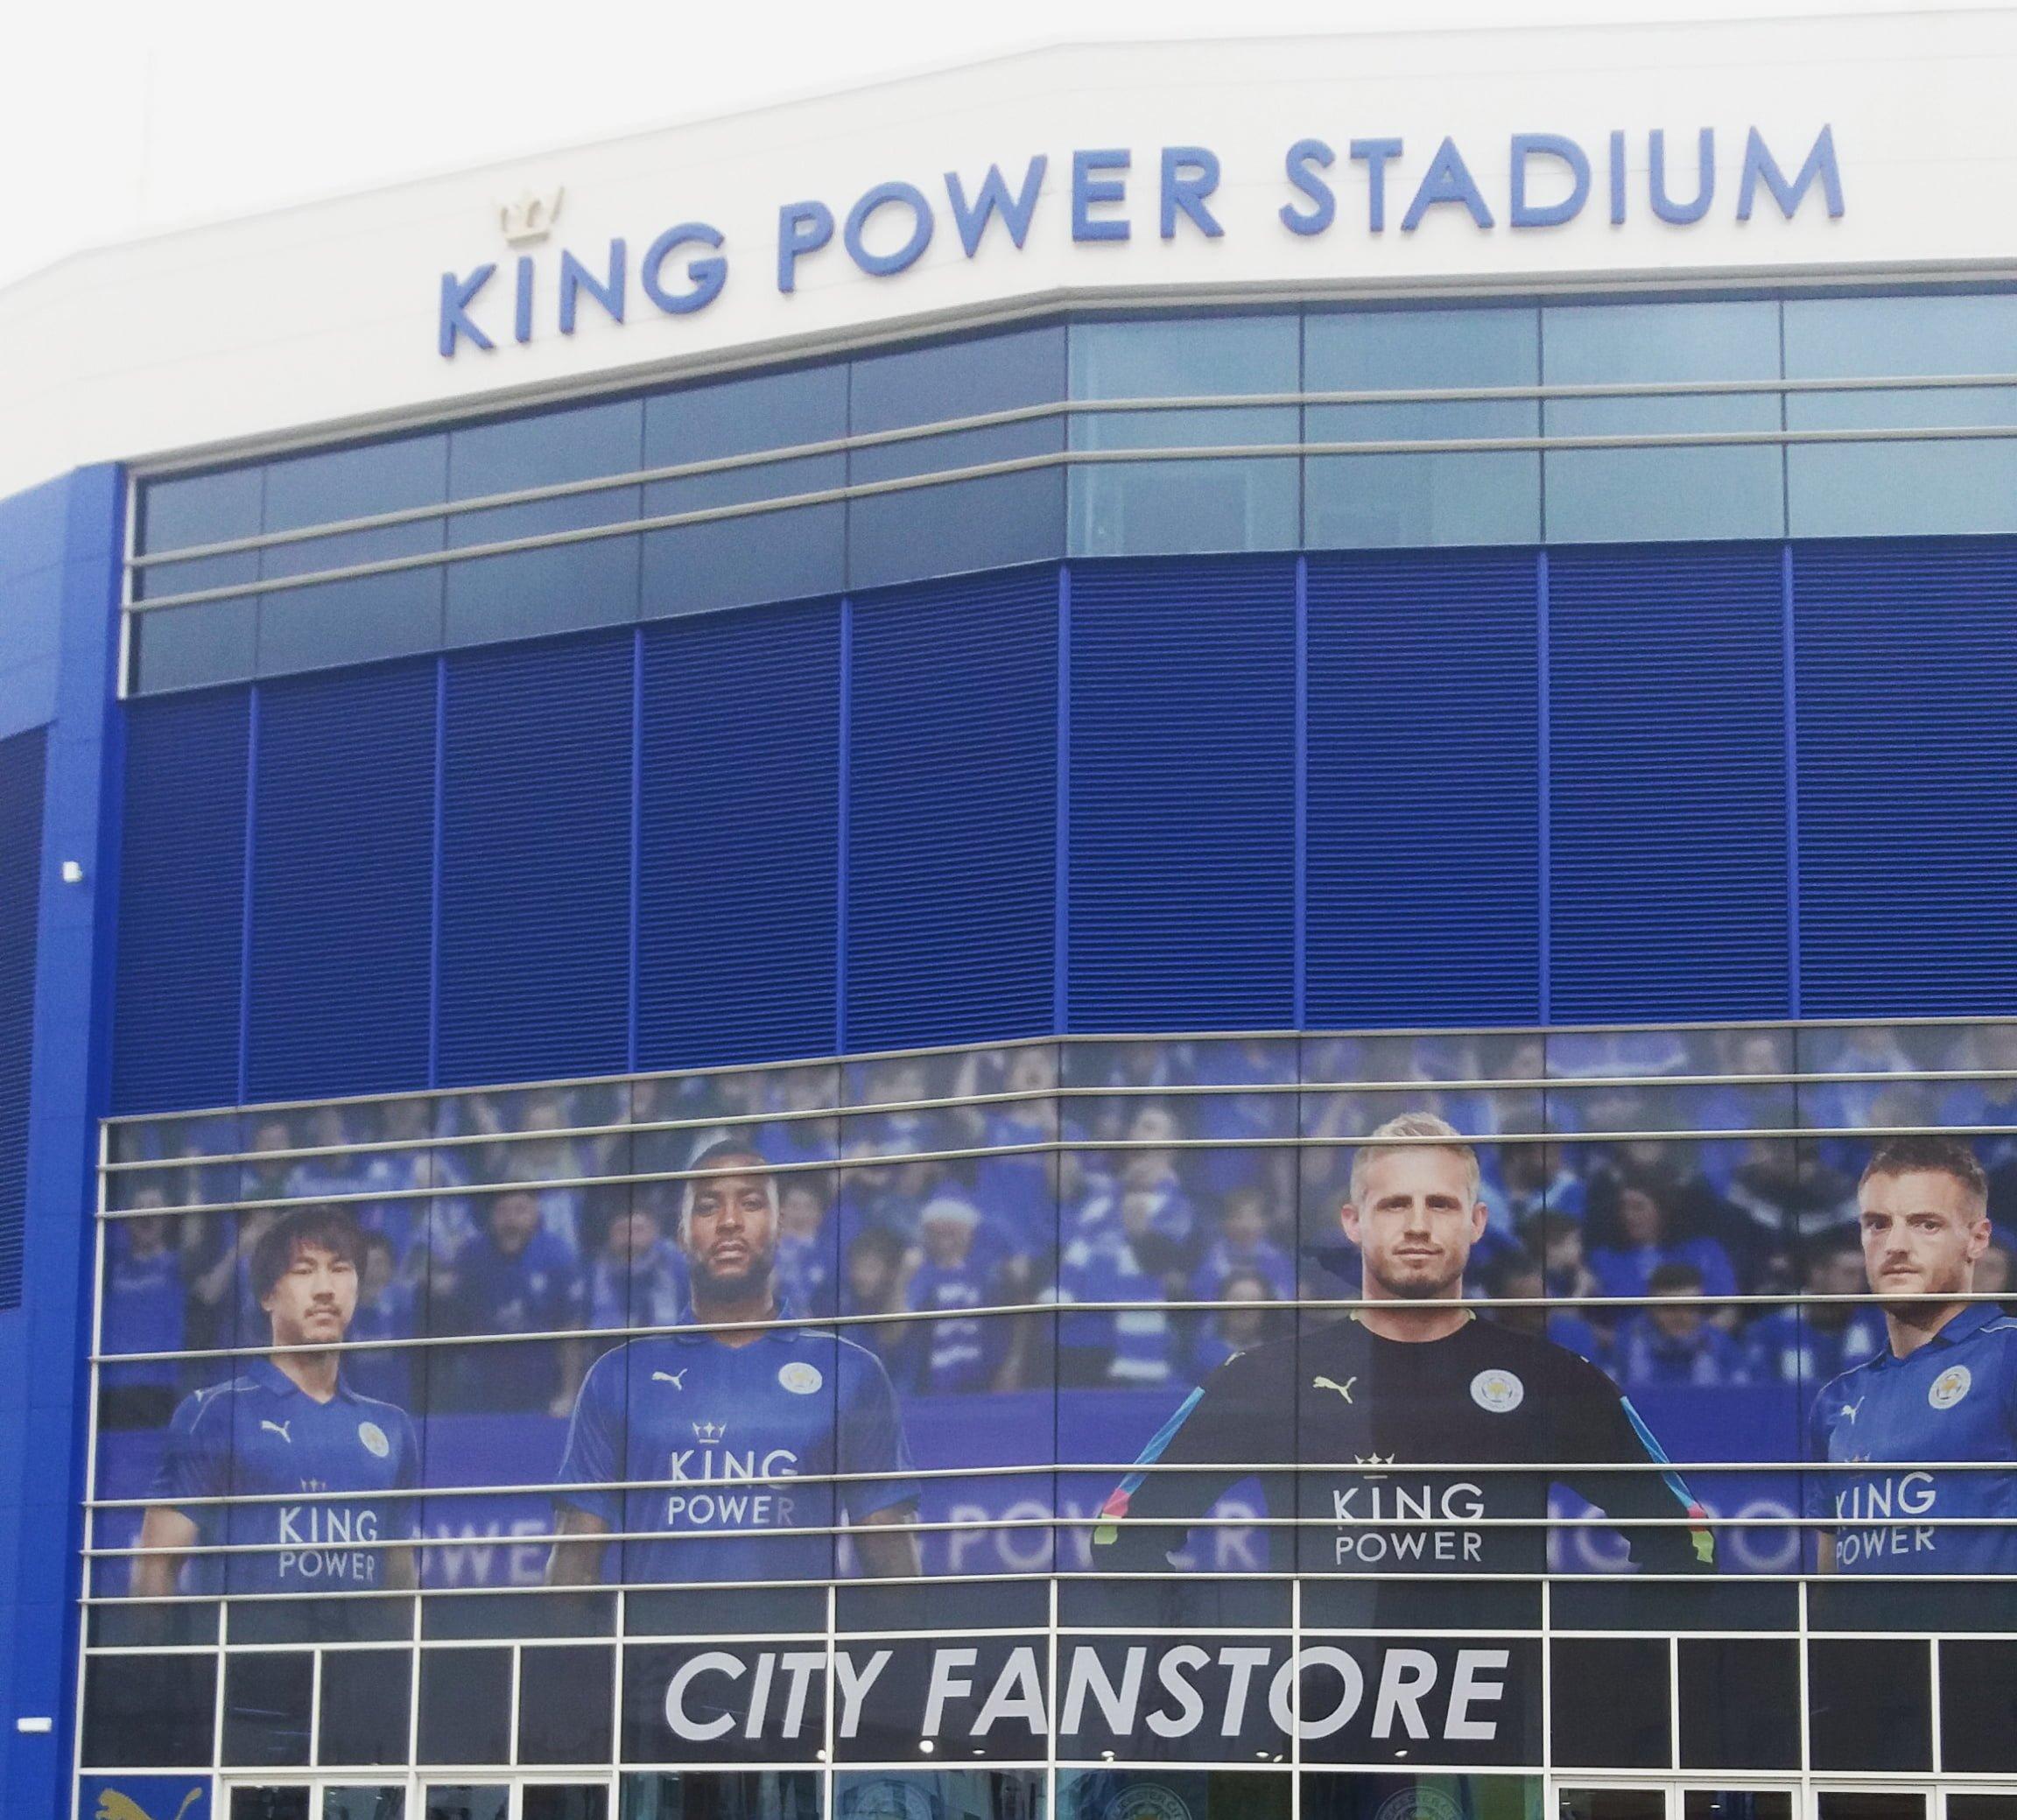 stadion-king-power-stadium-city-fanstore